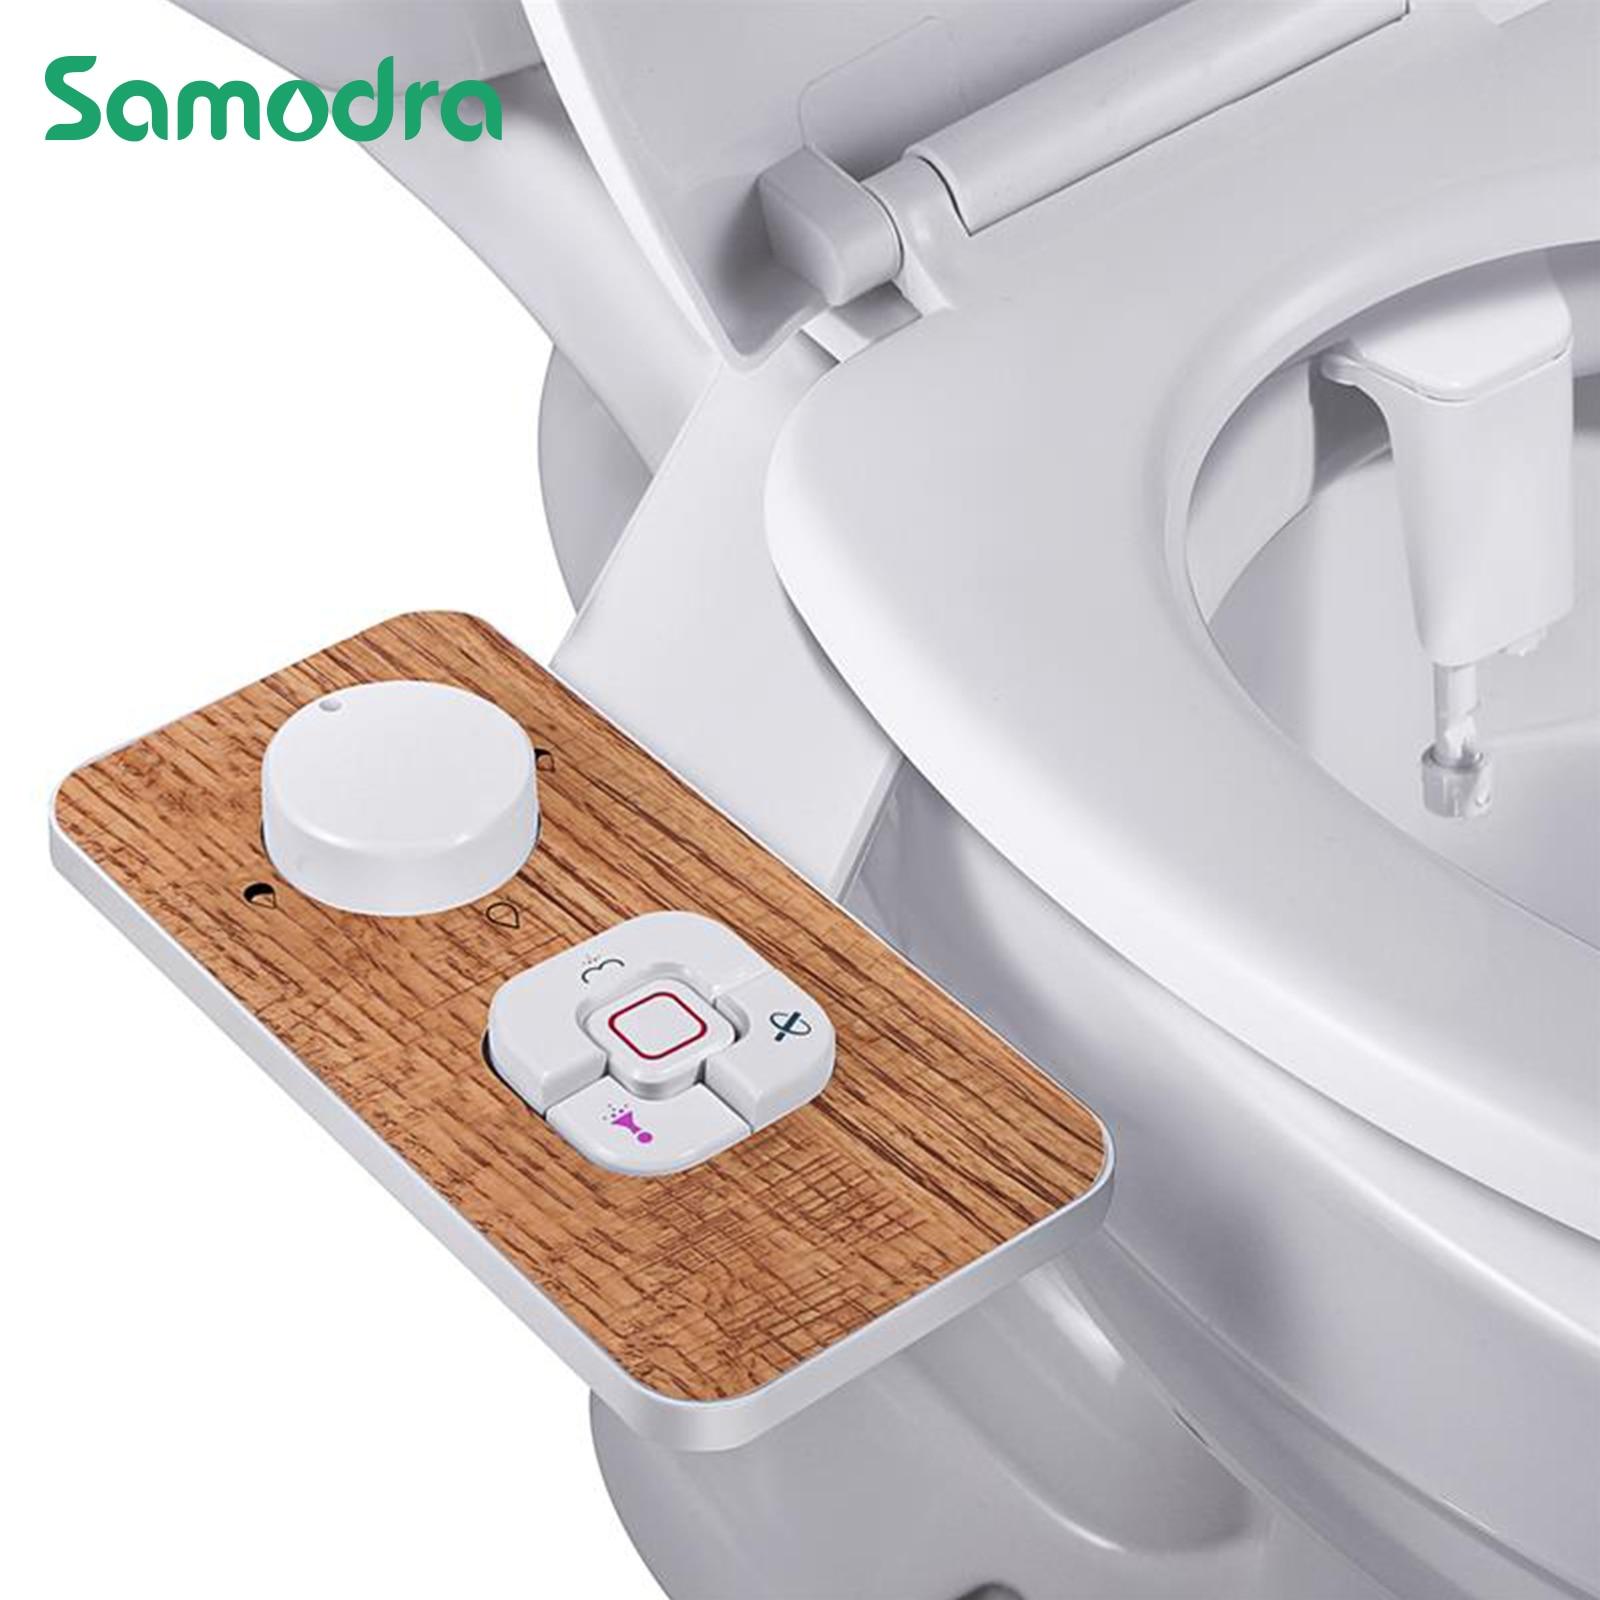 Samodra Toilet Bidet Toilet Seat Attachment Ultra-thin Non-electric Dual Nozzles Frontal & Rear Wash Ass Sprayer for Bathroom 1